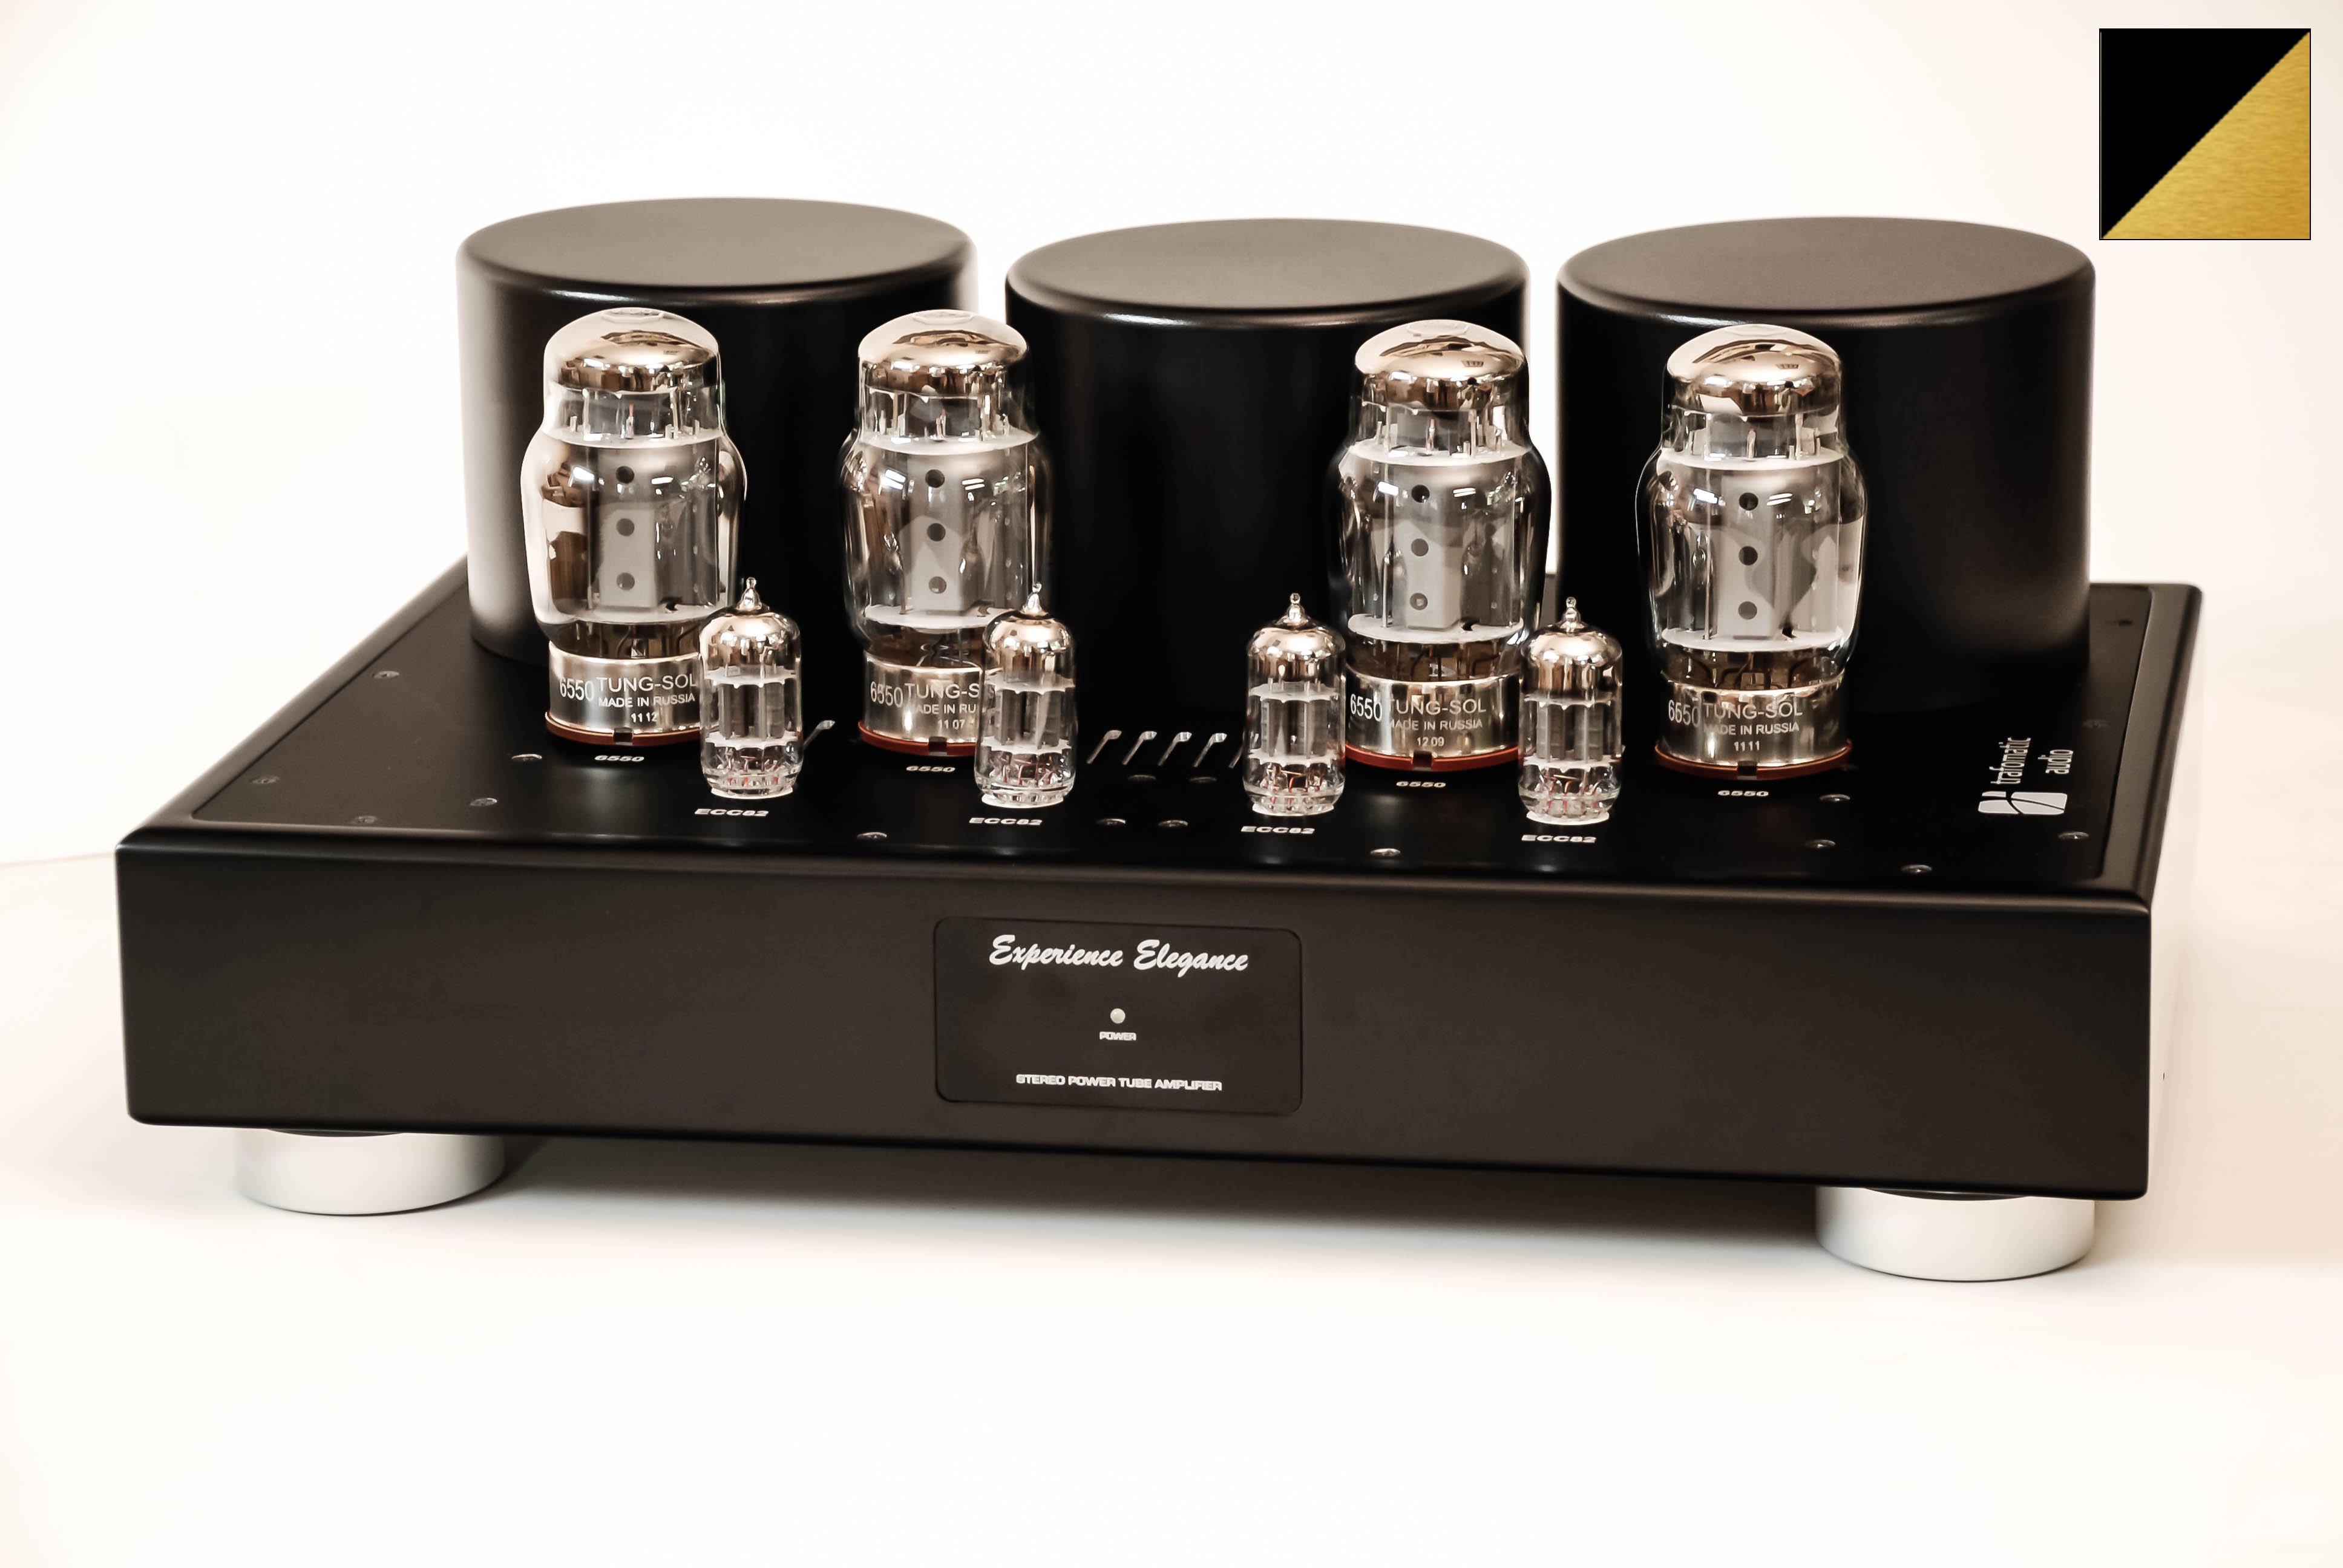 Усилители ламповые Trafomatic Audio Experience Elegance Power (black/gold finish) акустика центрального канала mt power elegance center black